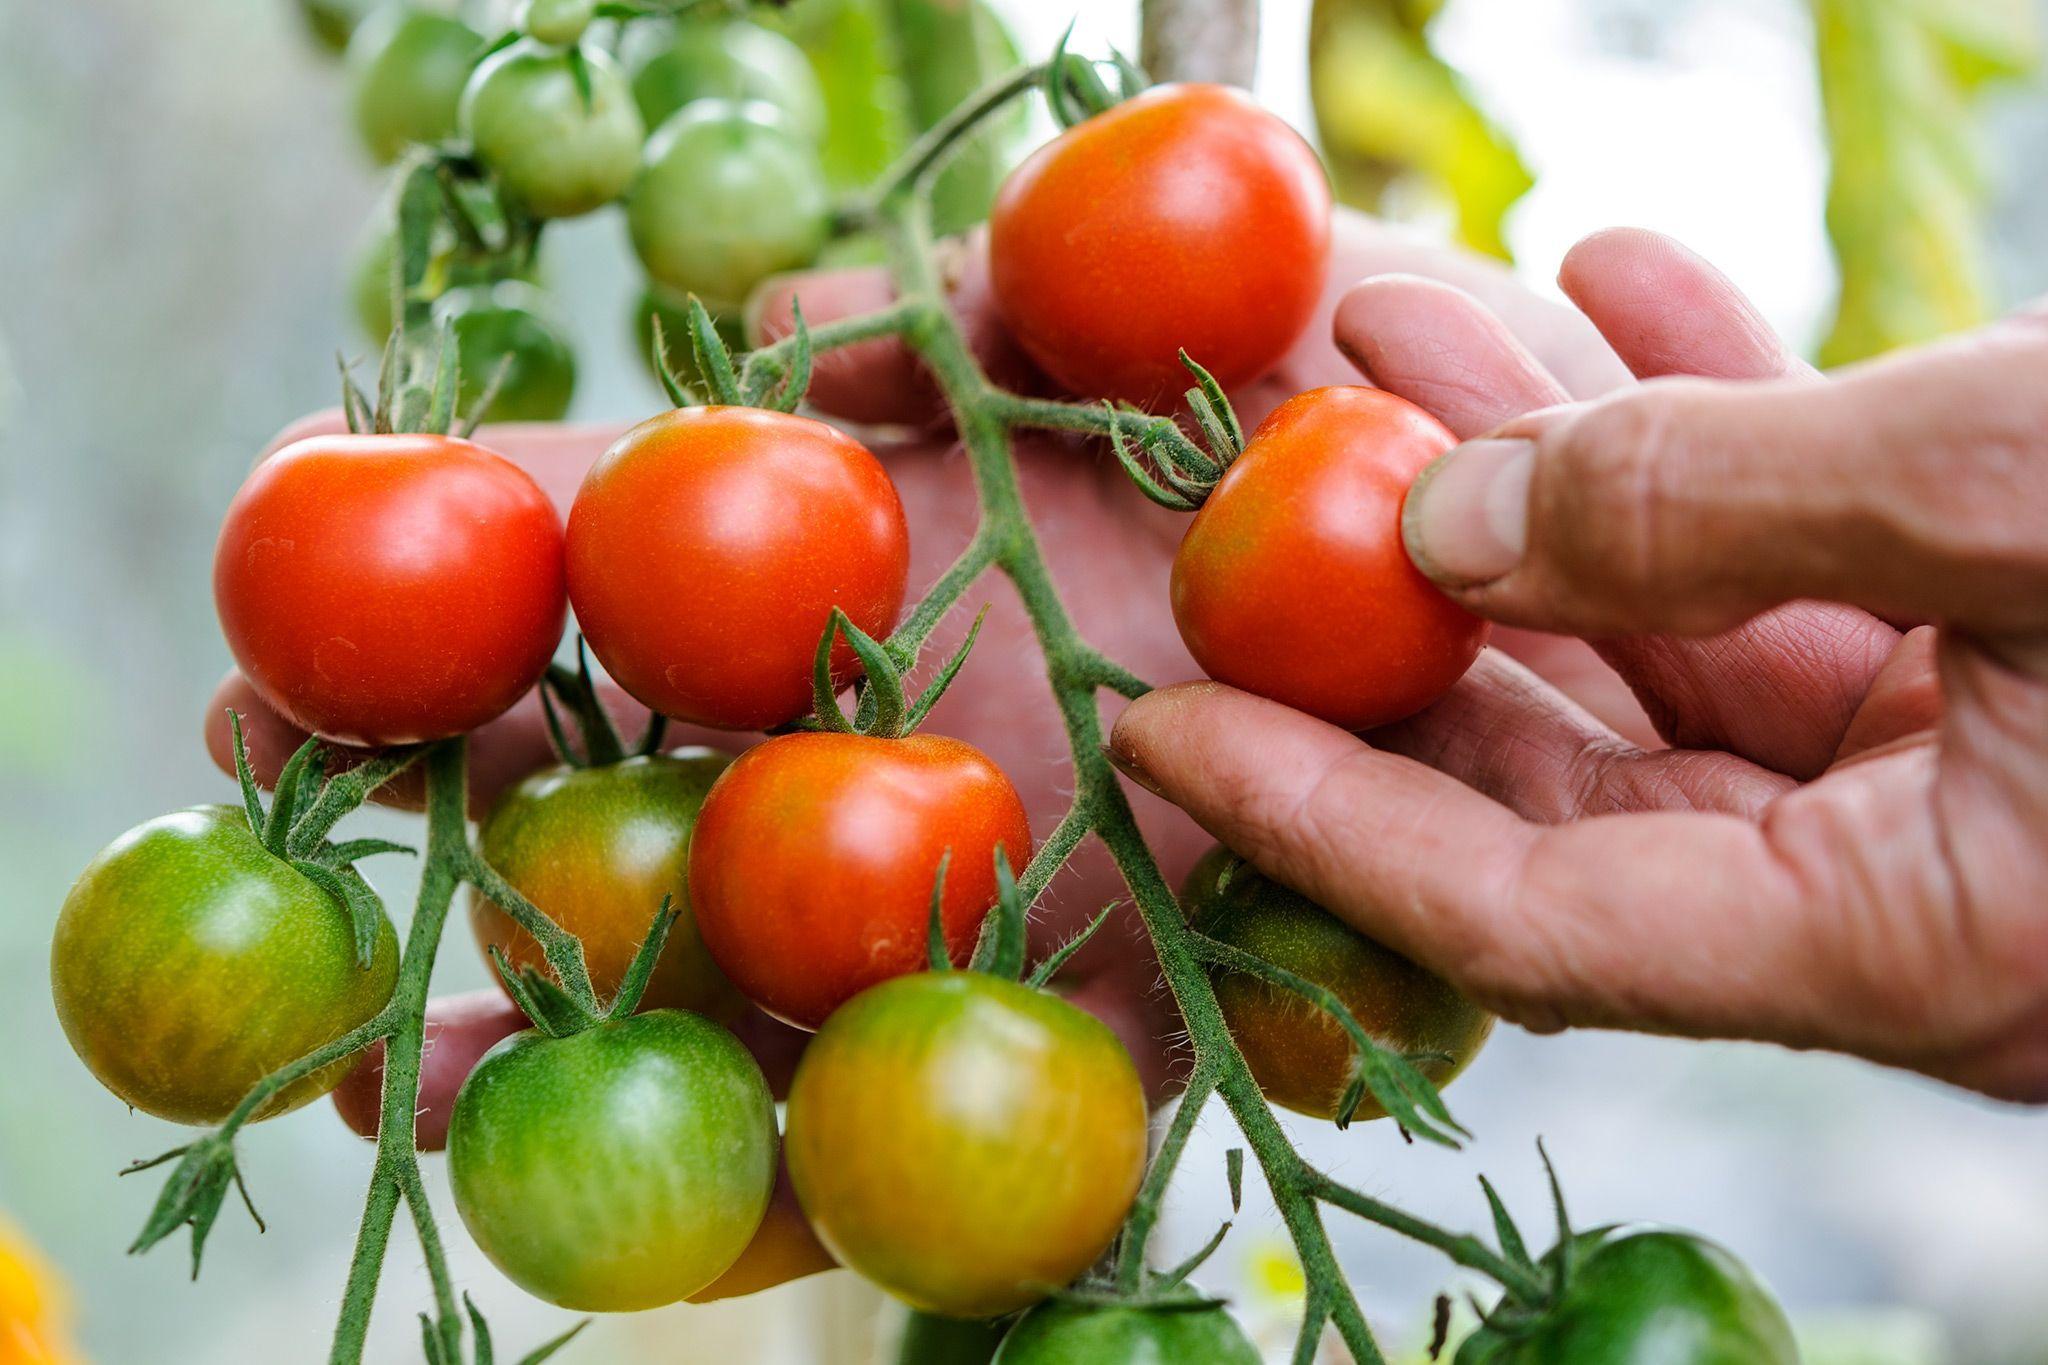 1c1e12f2753afcf174f099b39ab0b3ed - Gardeners World Magazine Free Tomato Seeds